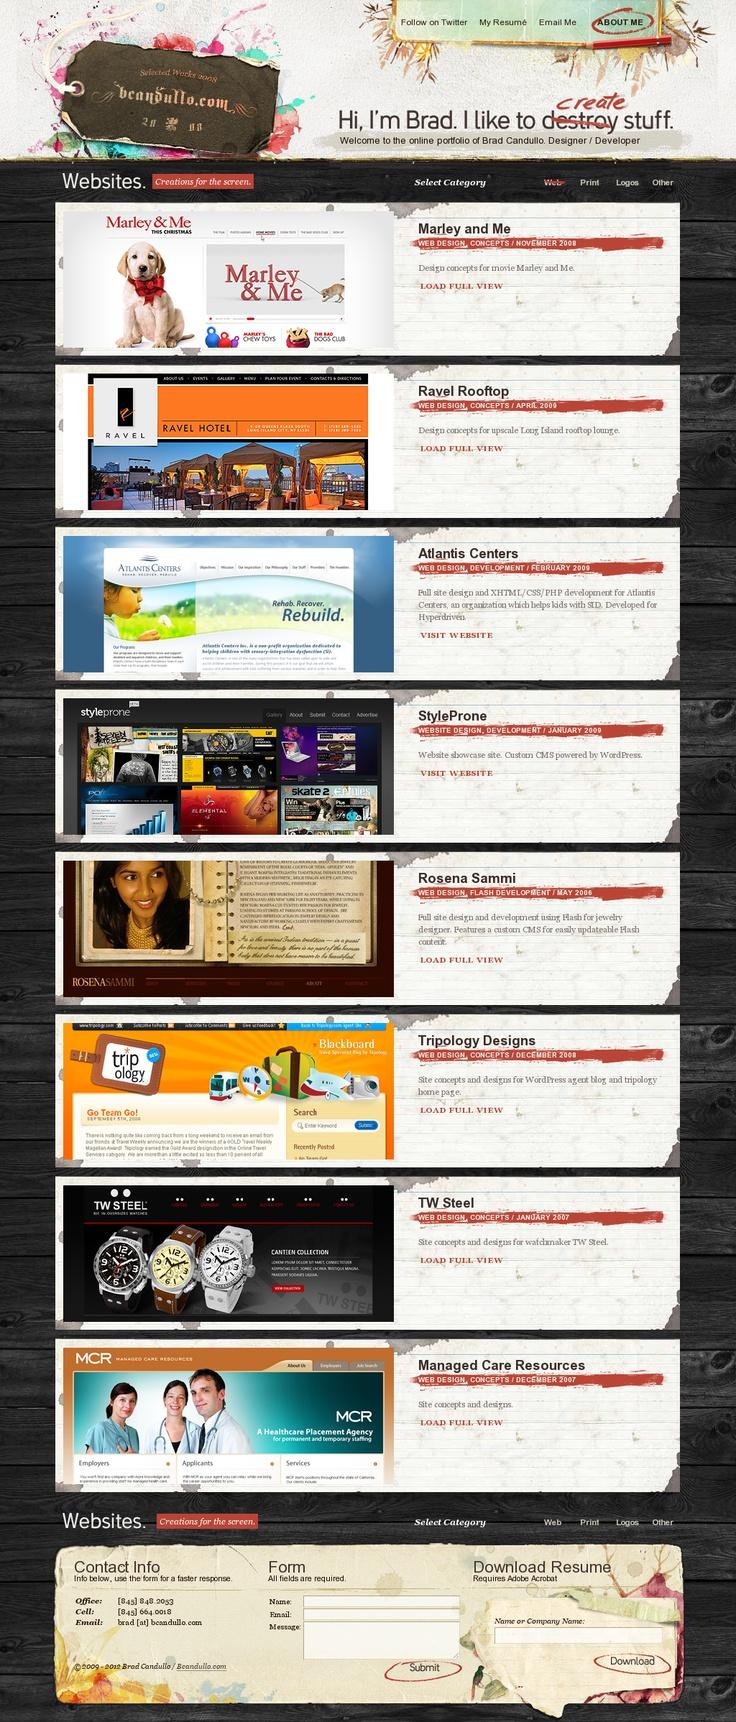 Layout photoshop web design website template tutorials tutorial 022 -  Portfolio Design Bcandullo